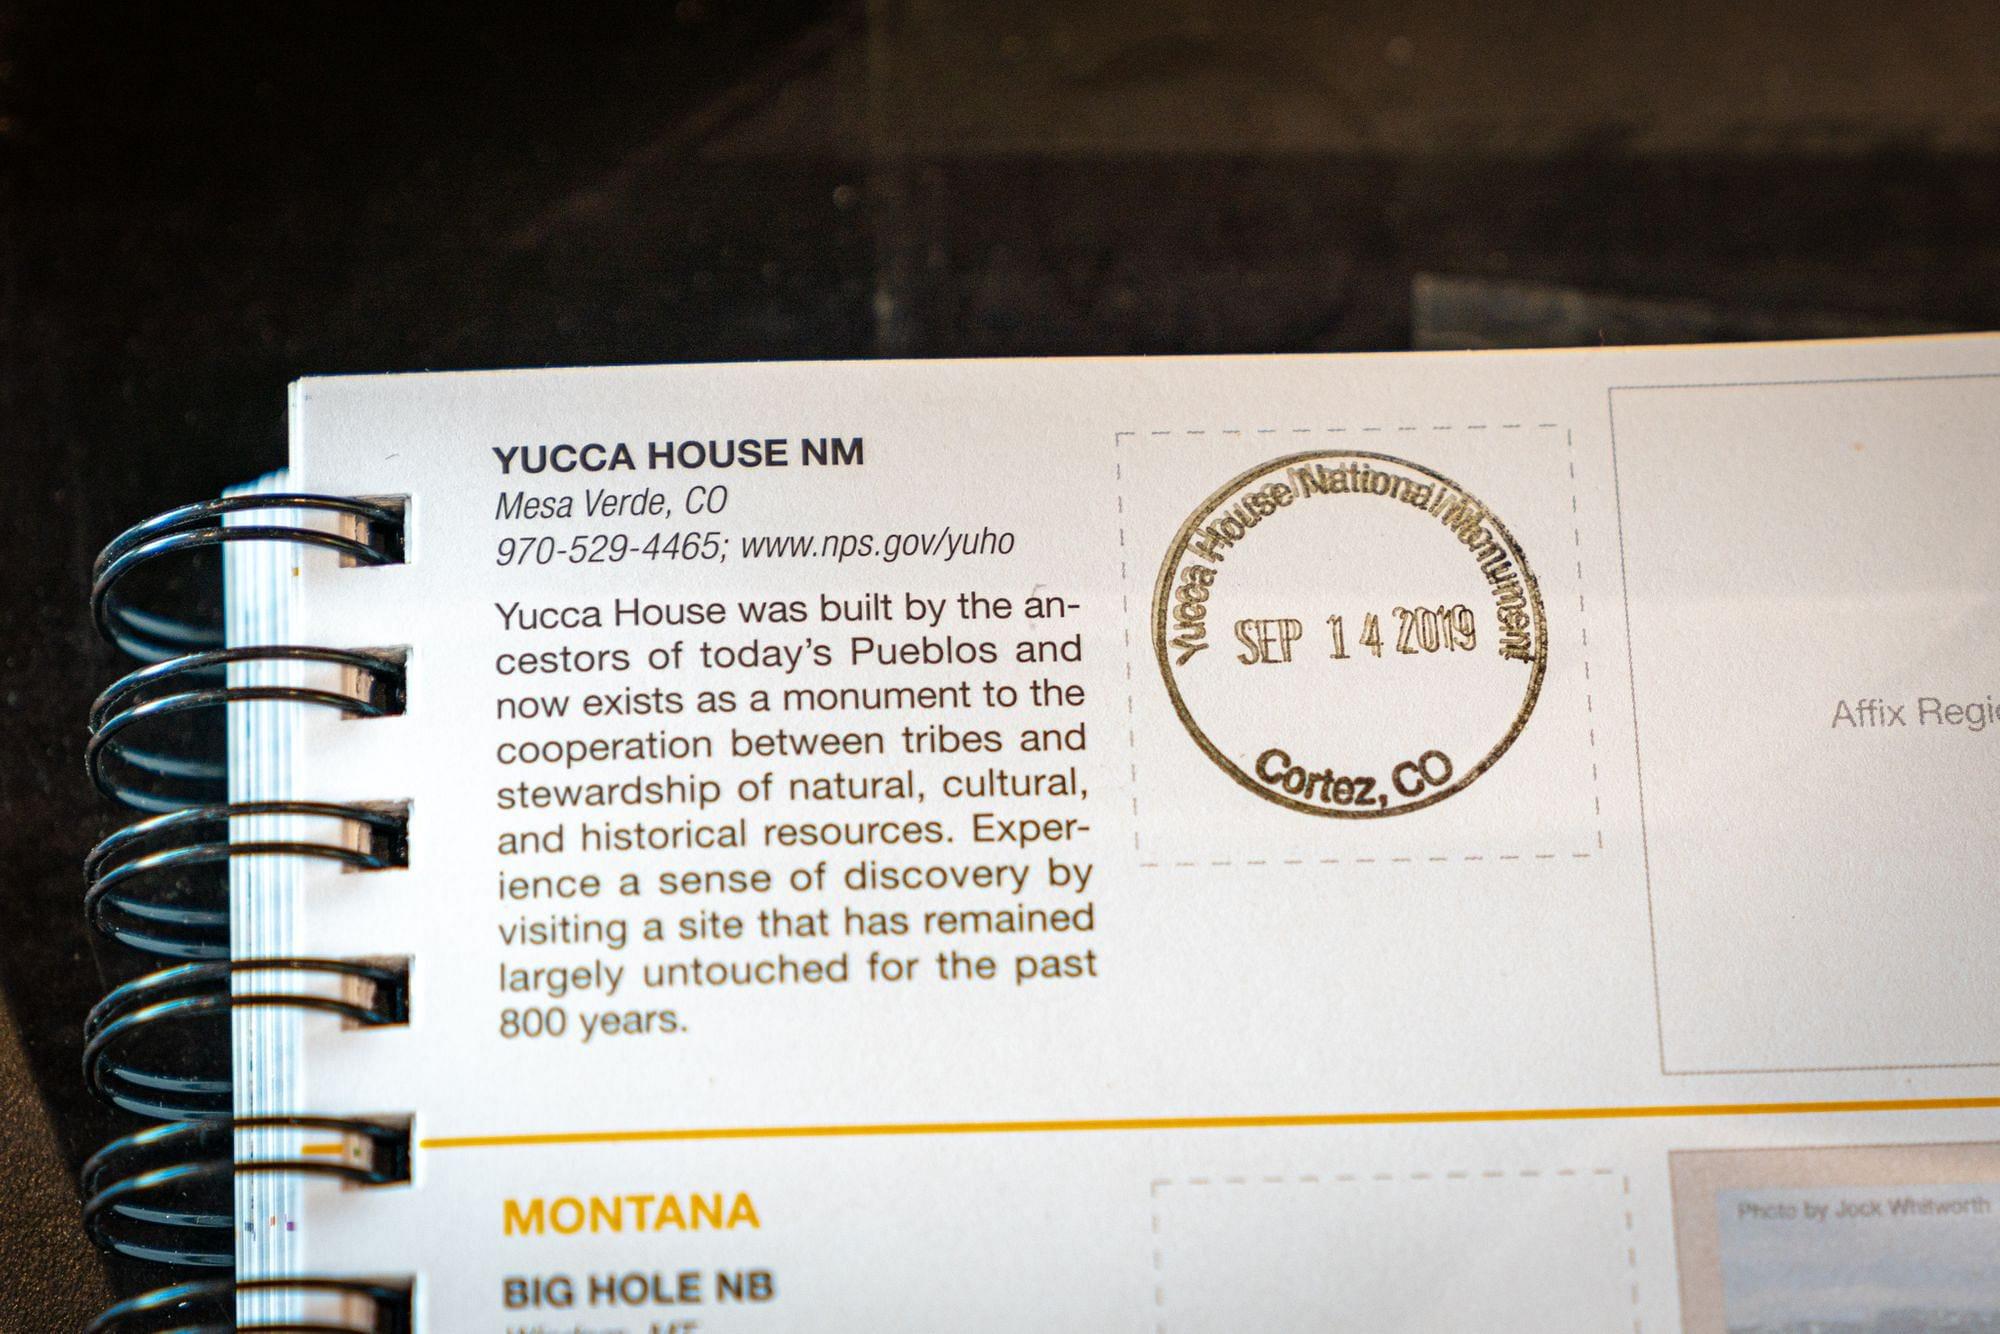 Yucca House Park Passport Stamp